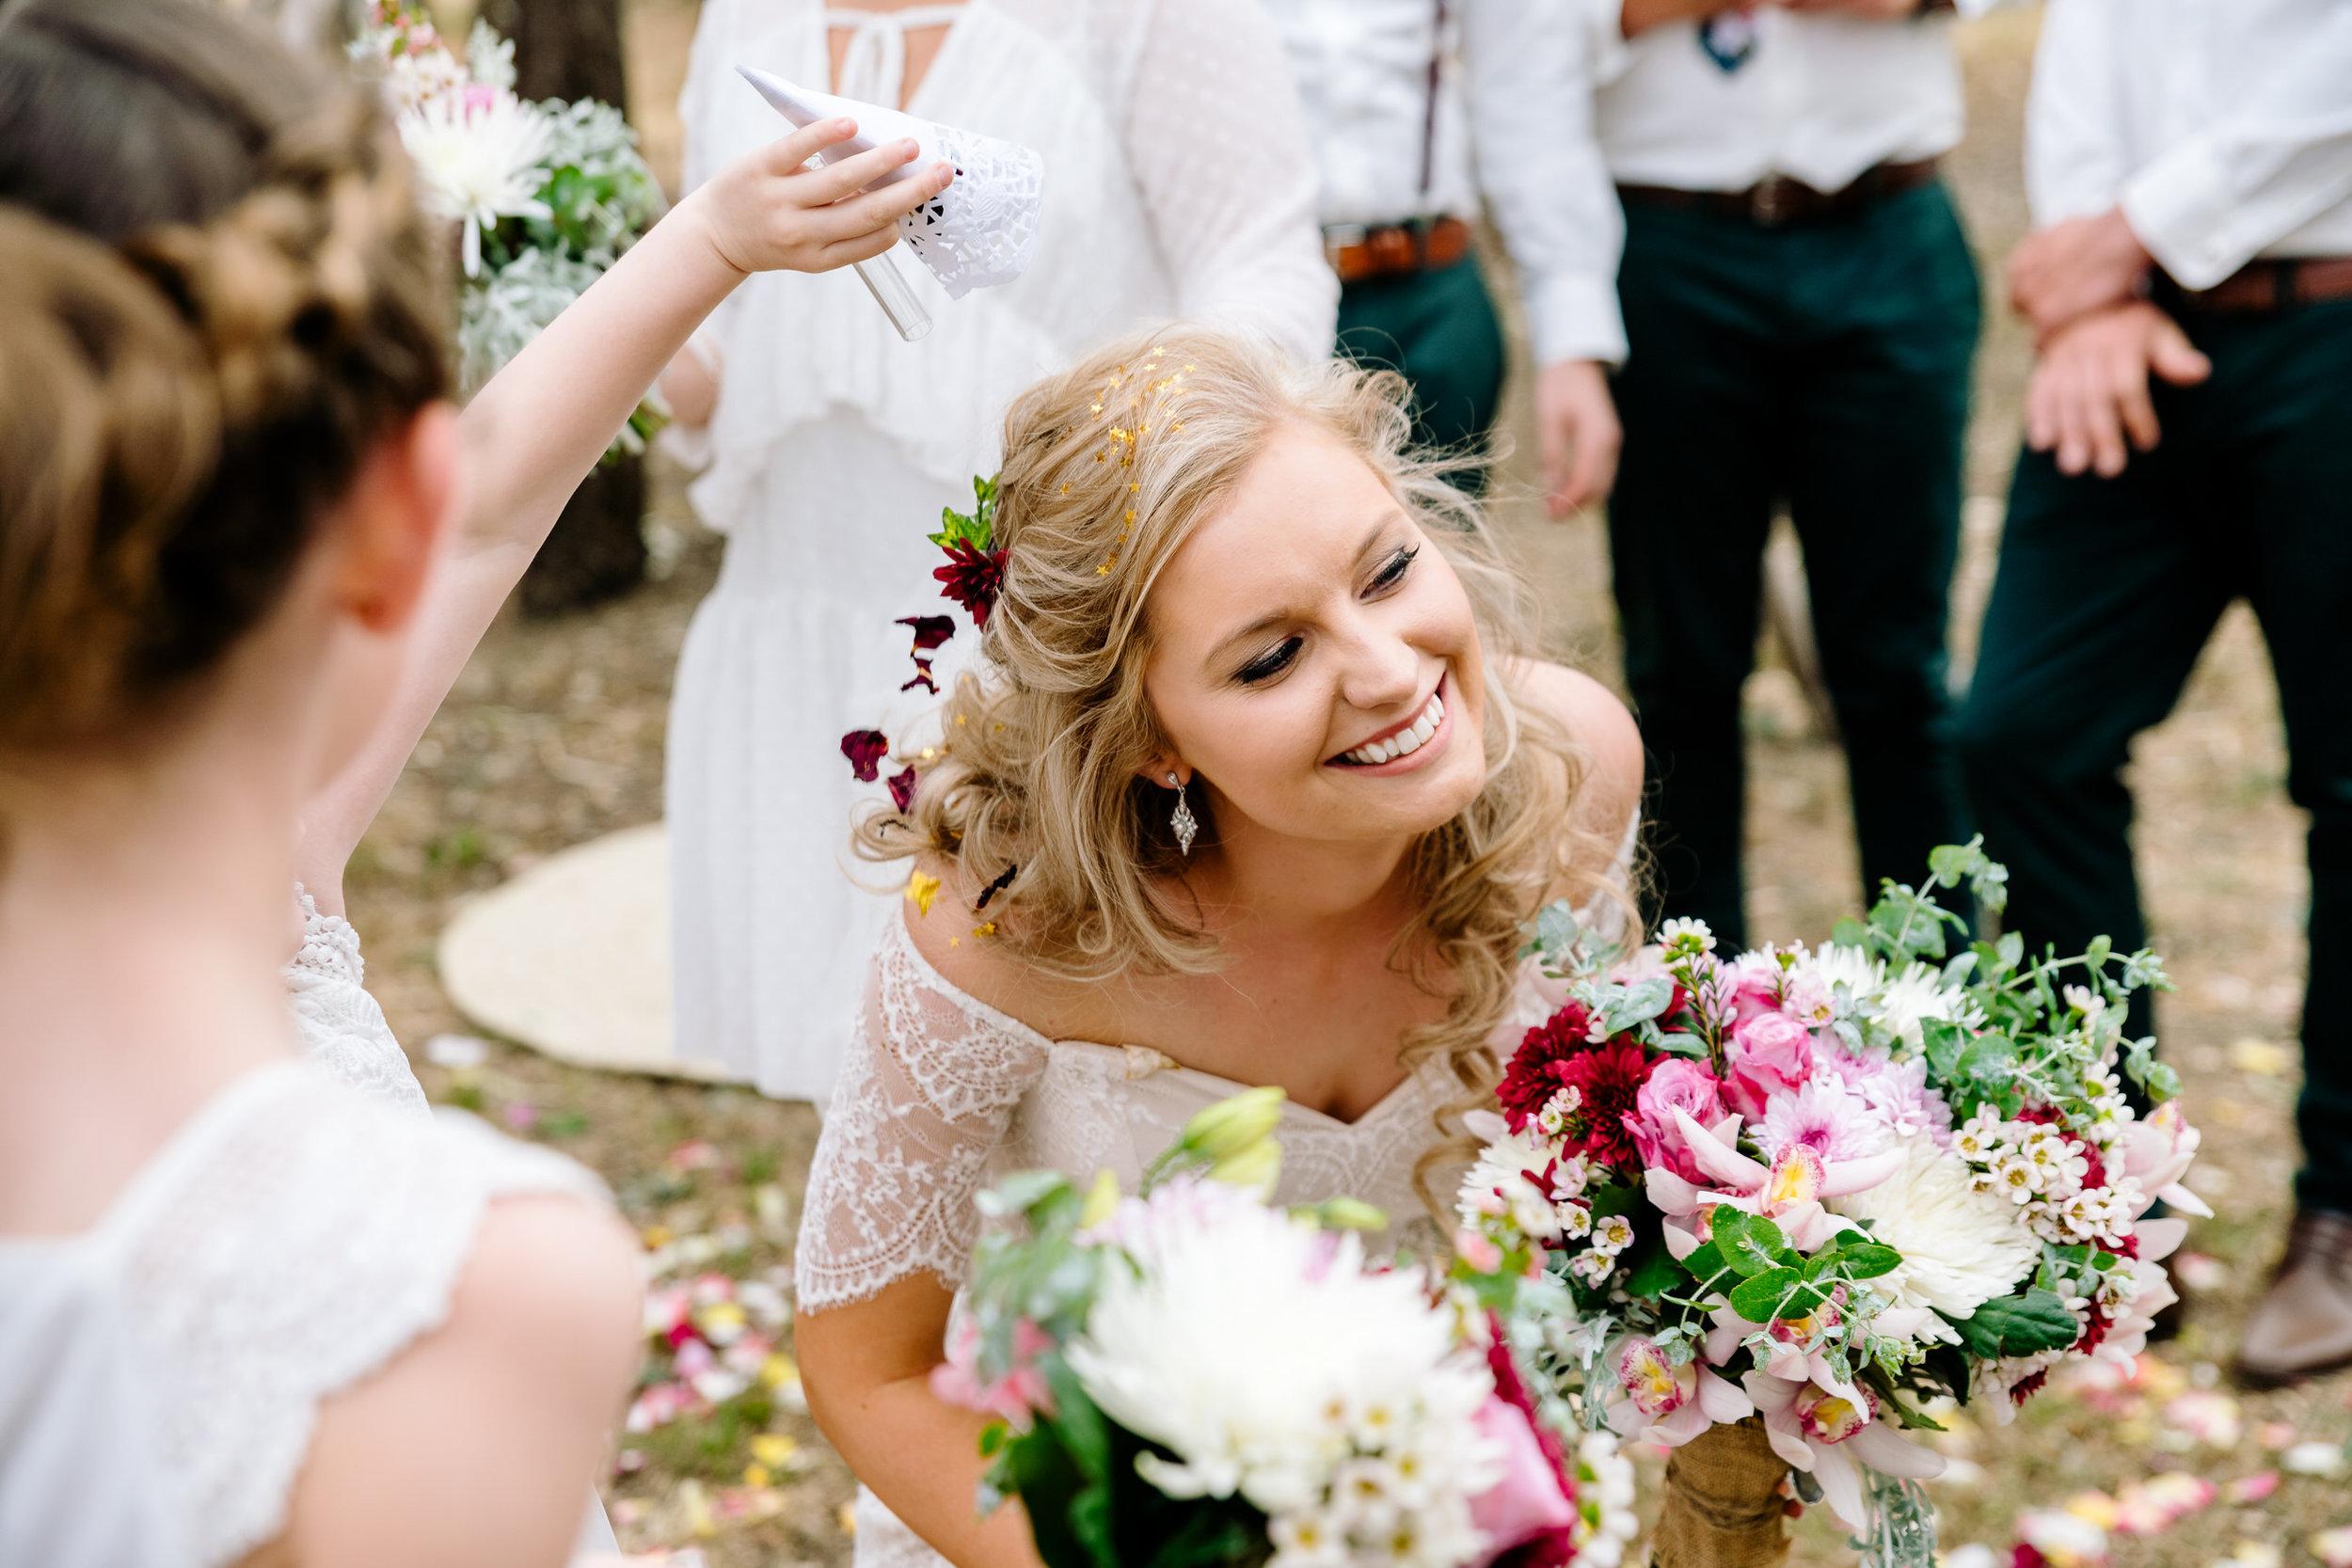 Justin_And_Jim_Photography_Backyard_Wedding181.JPG